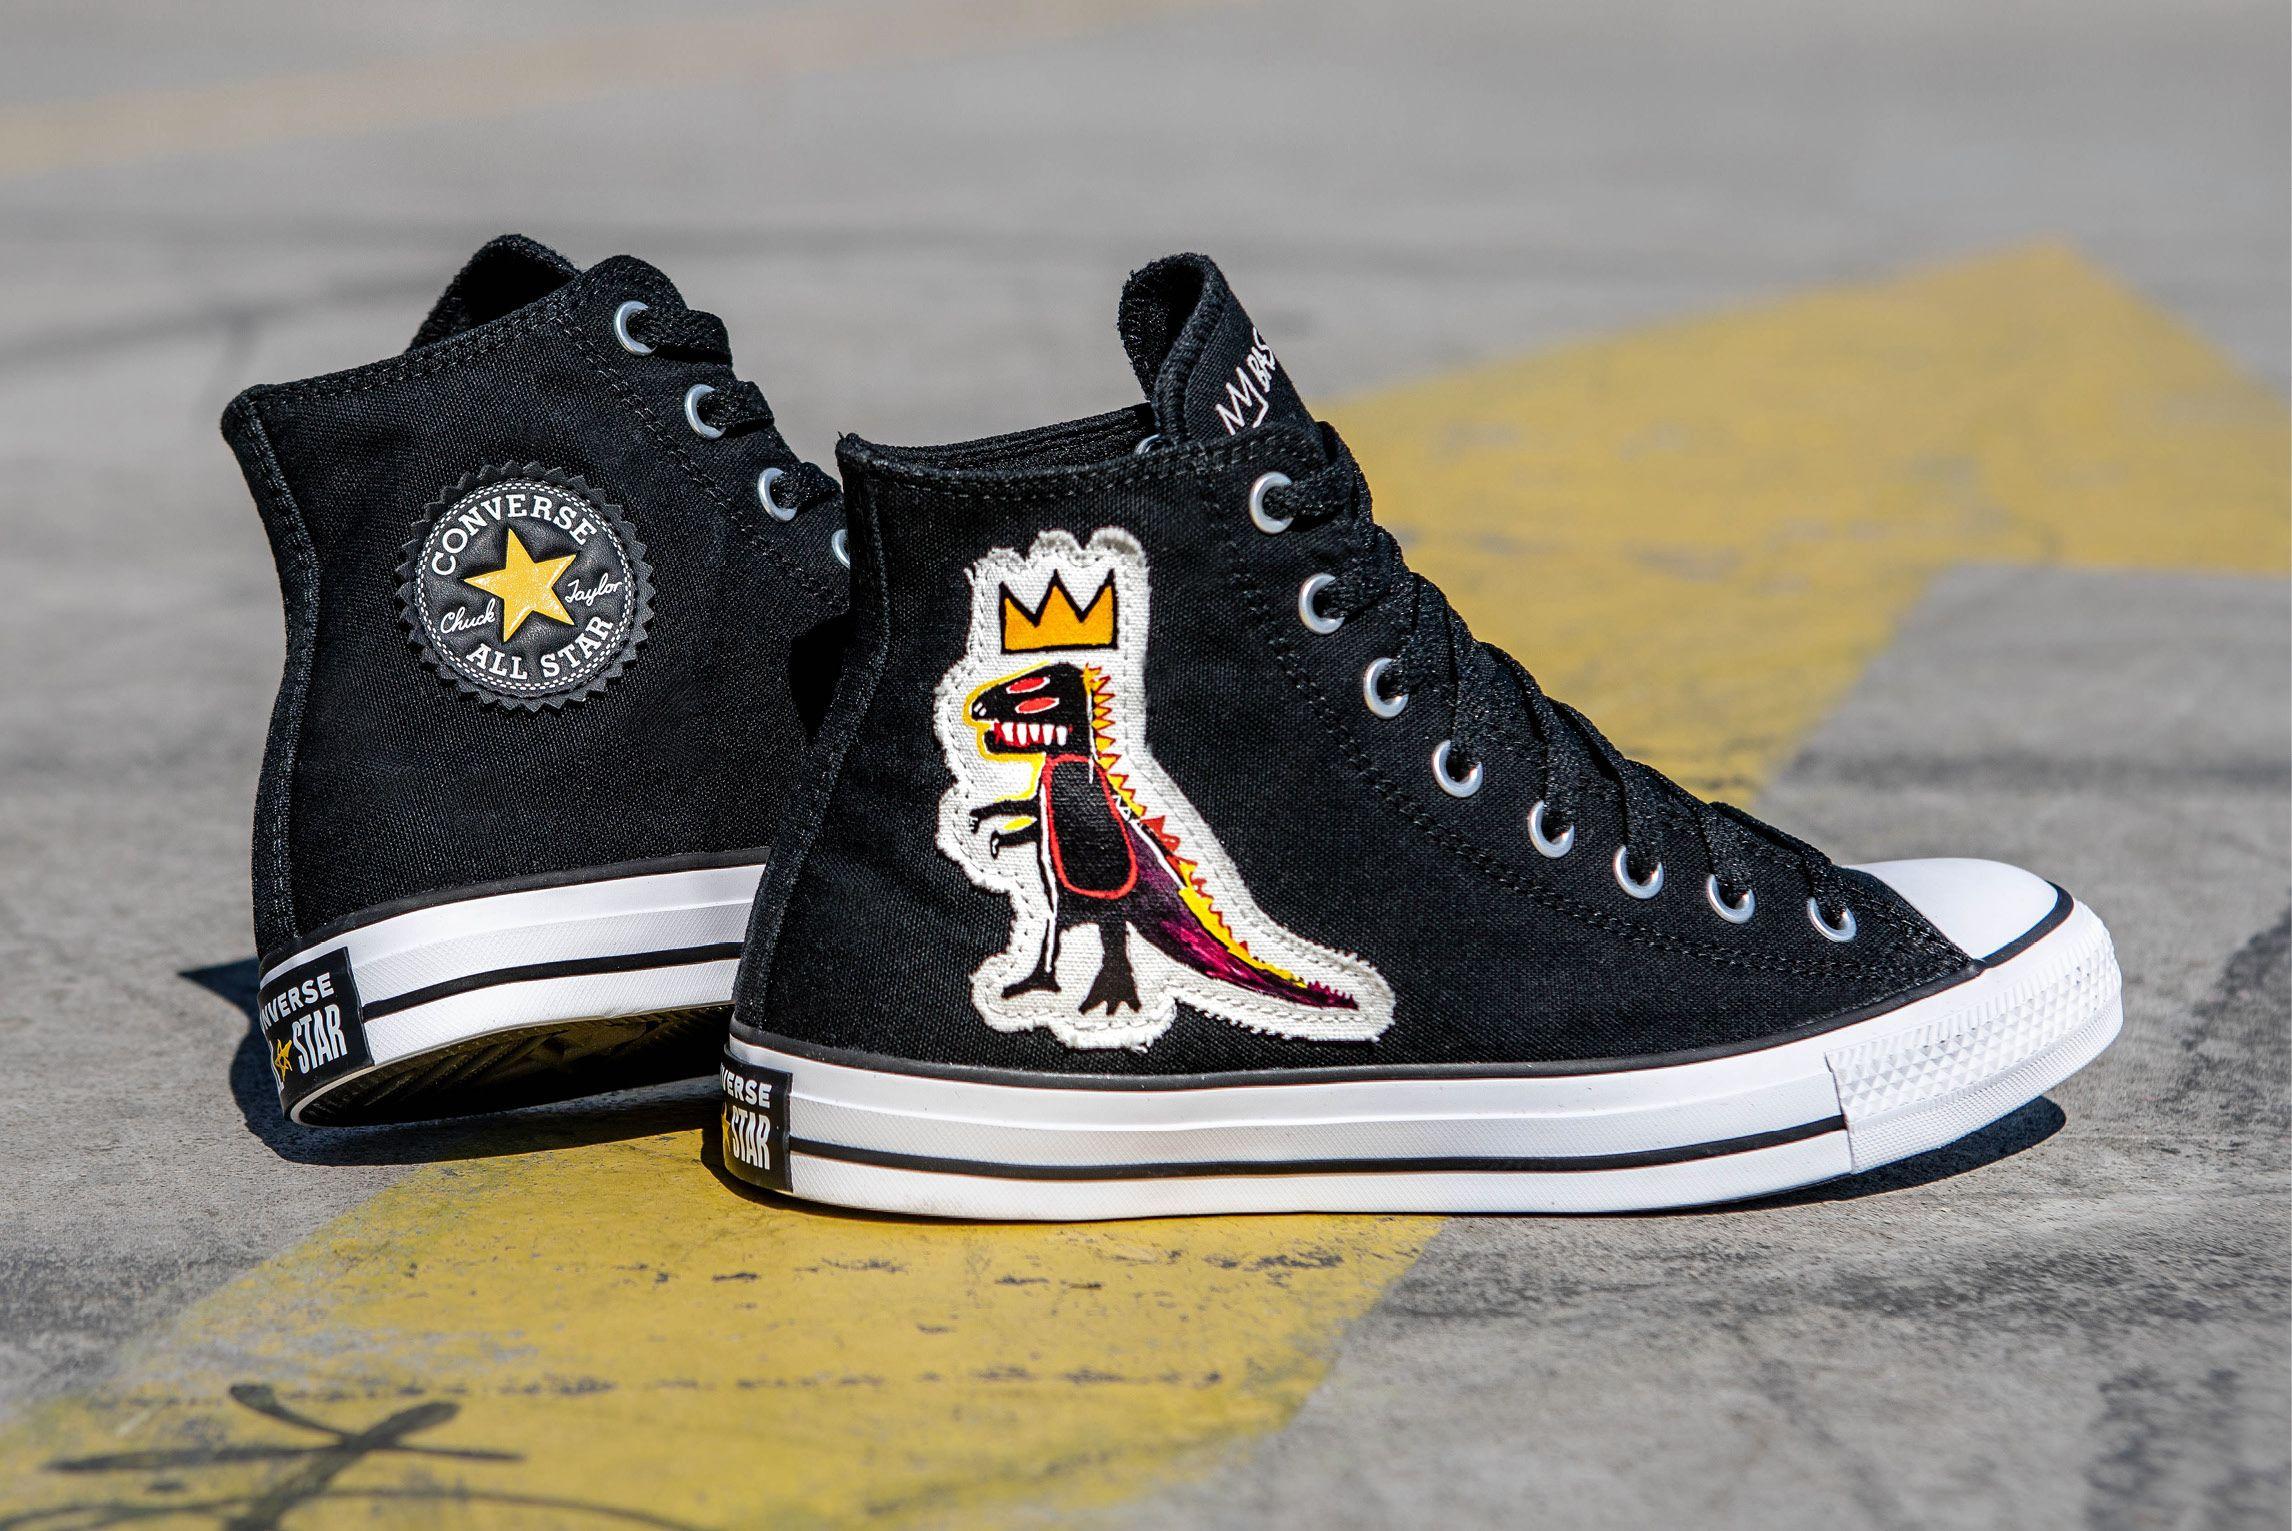 Jean-Michel Basquiat x Converse Chuck Taylor All Star